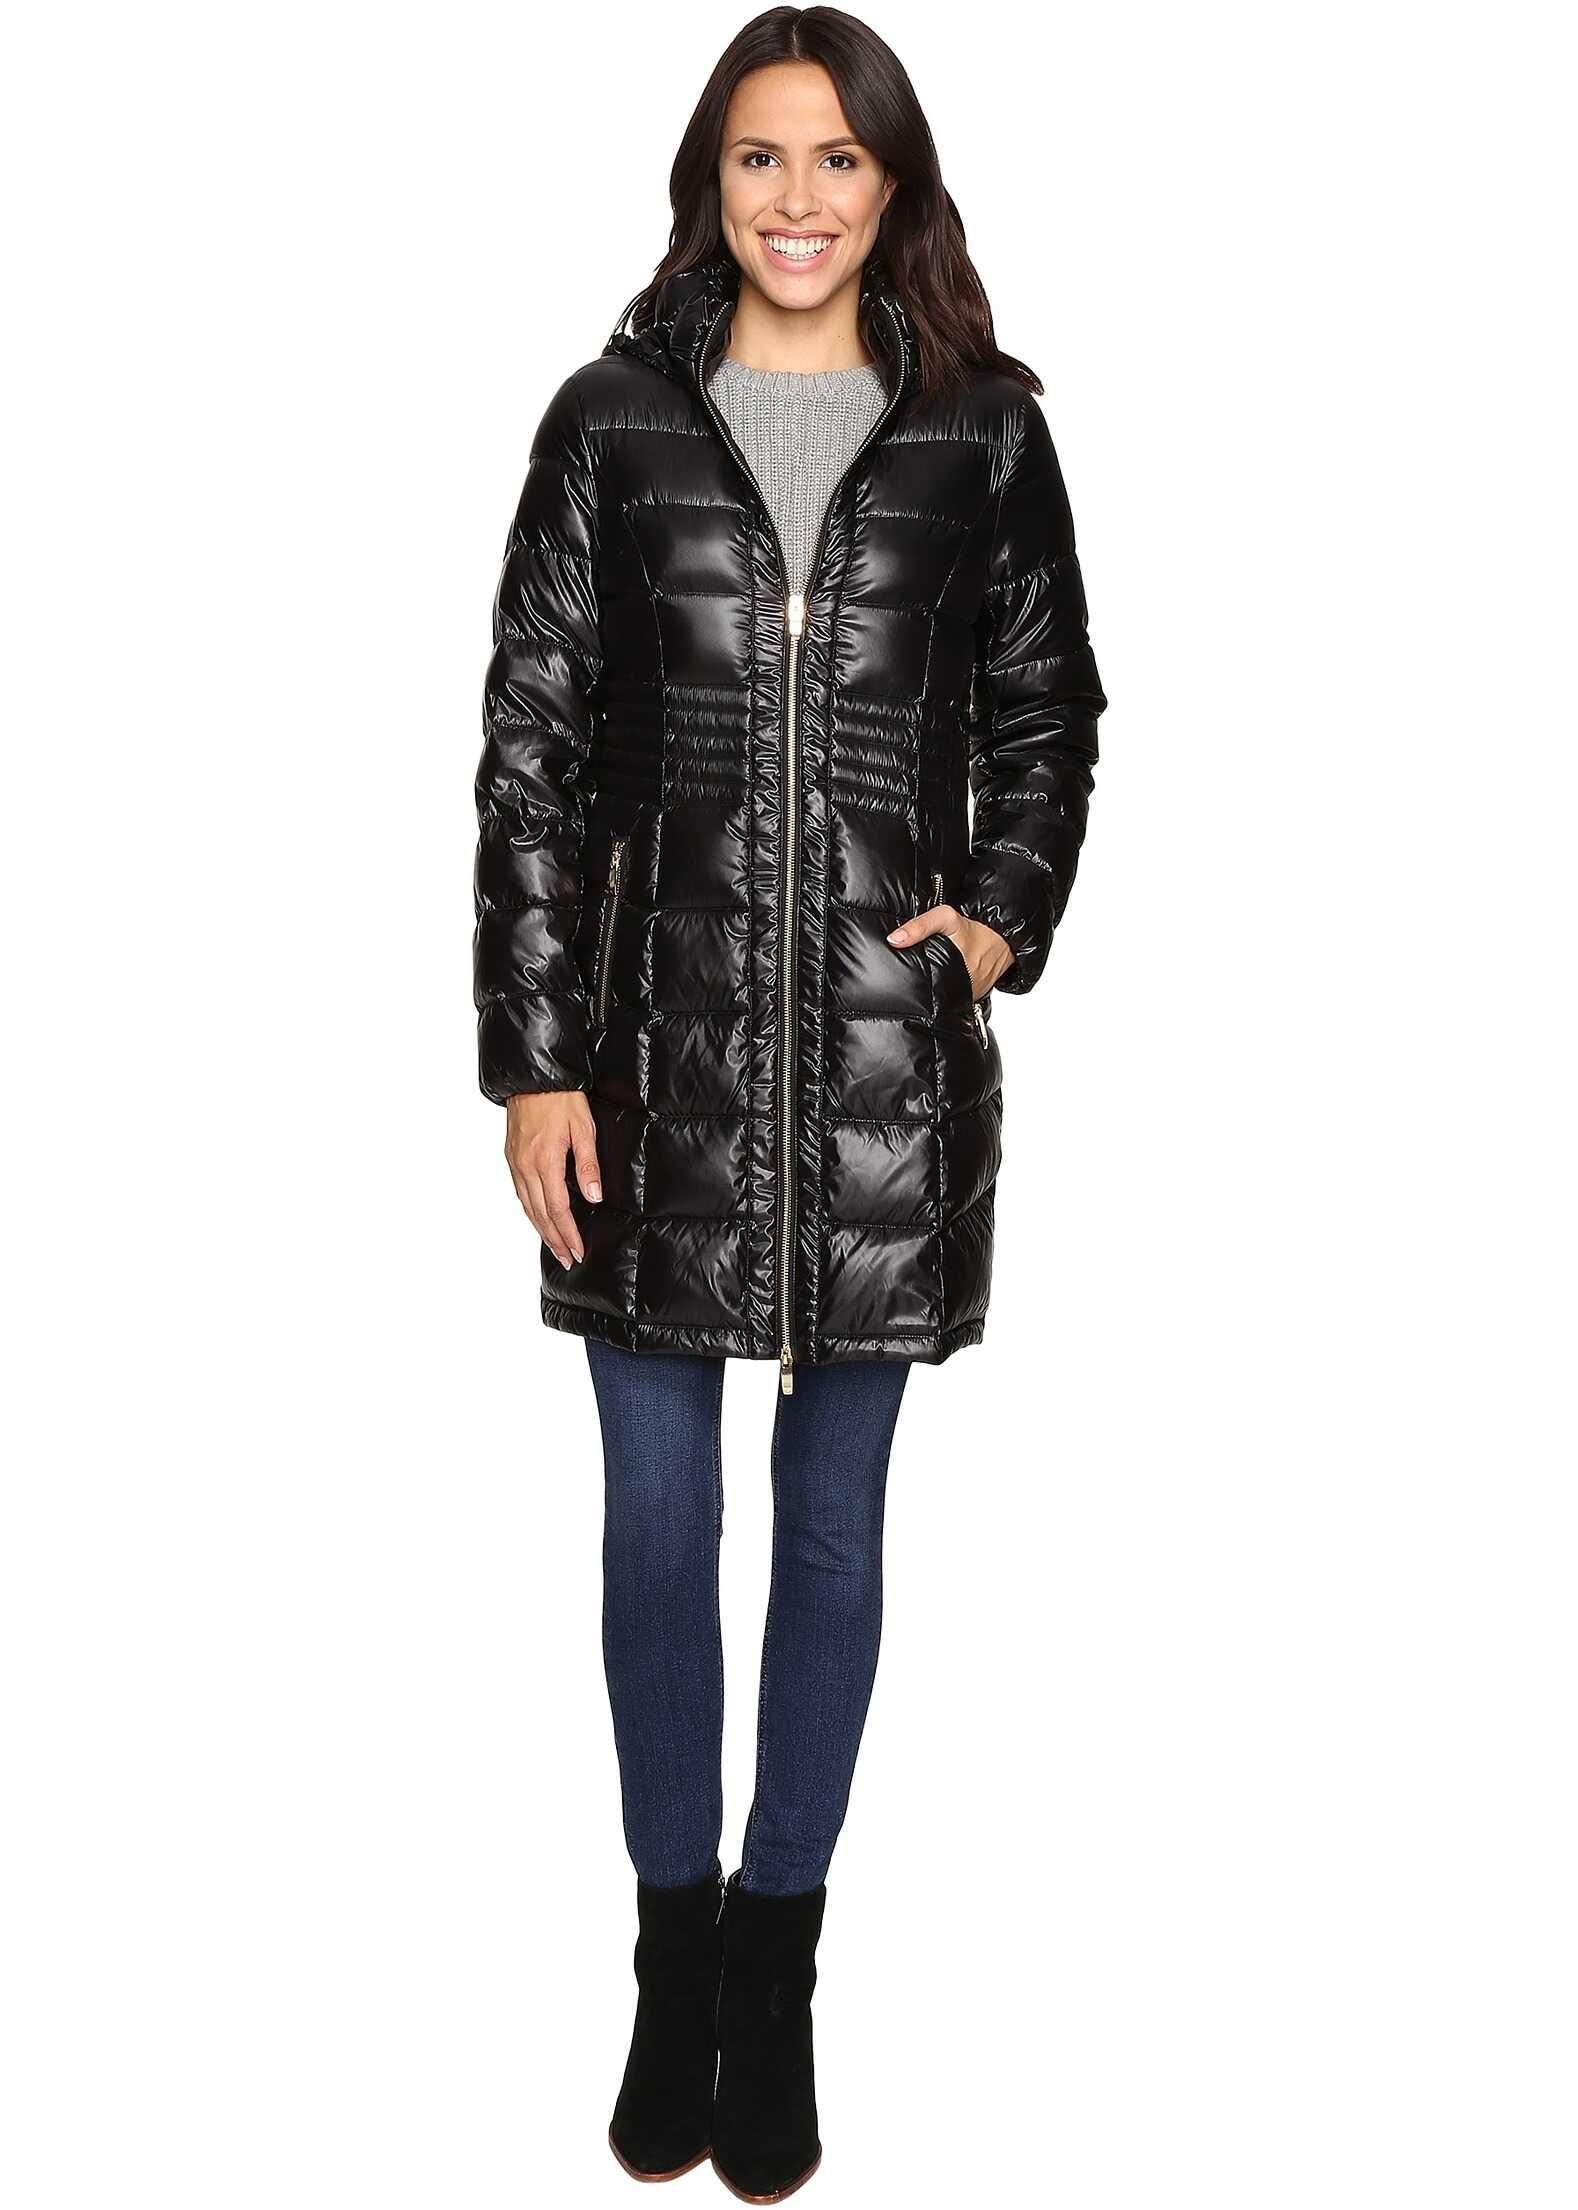 Via Spiga Metallic Hooded Packable Down Coat Black